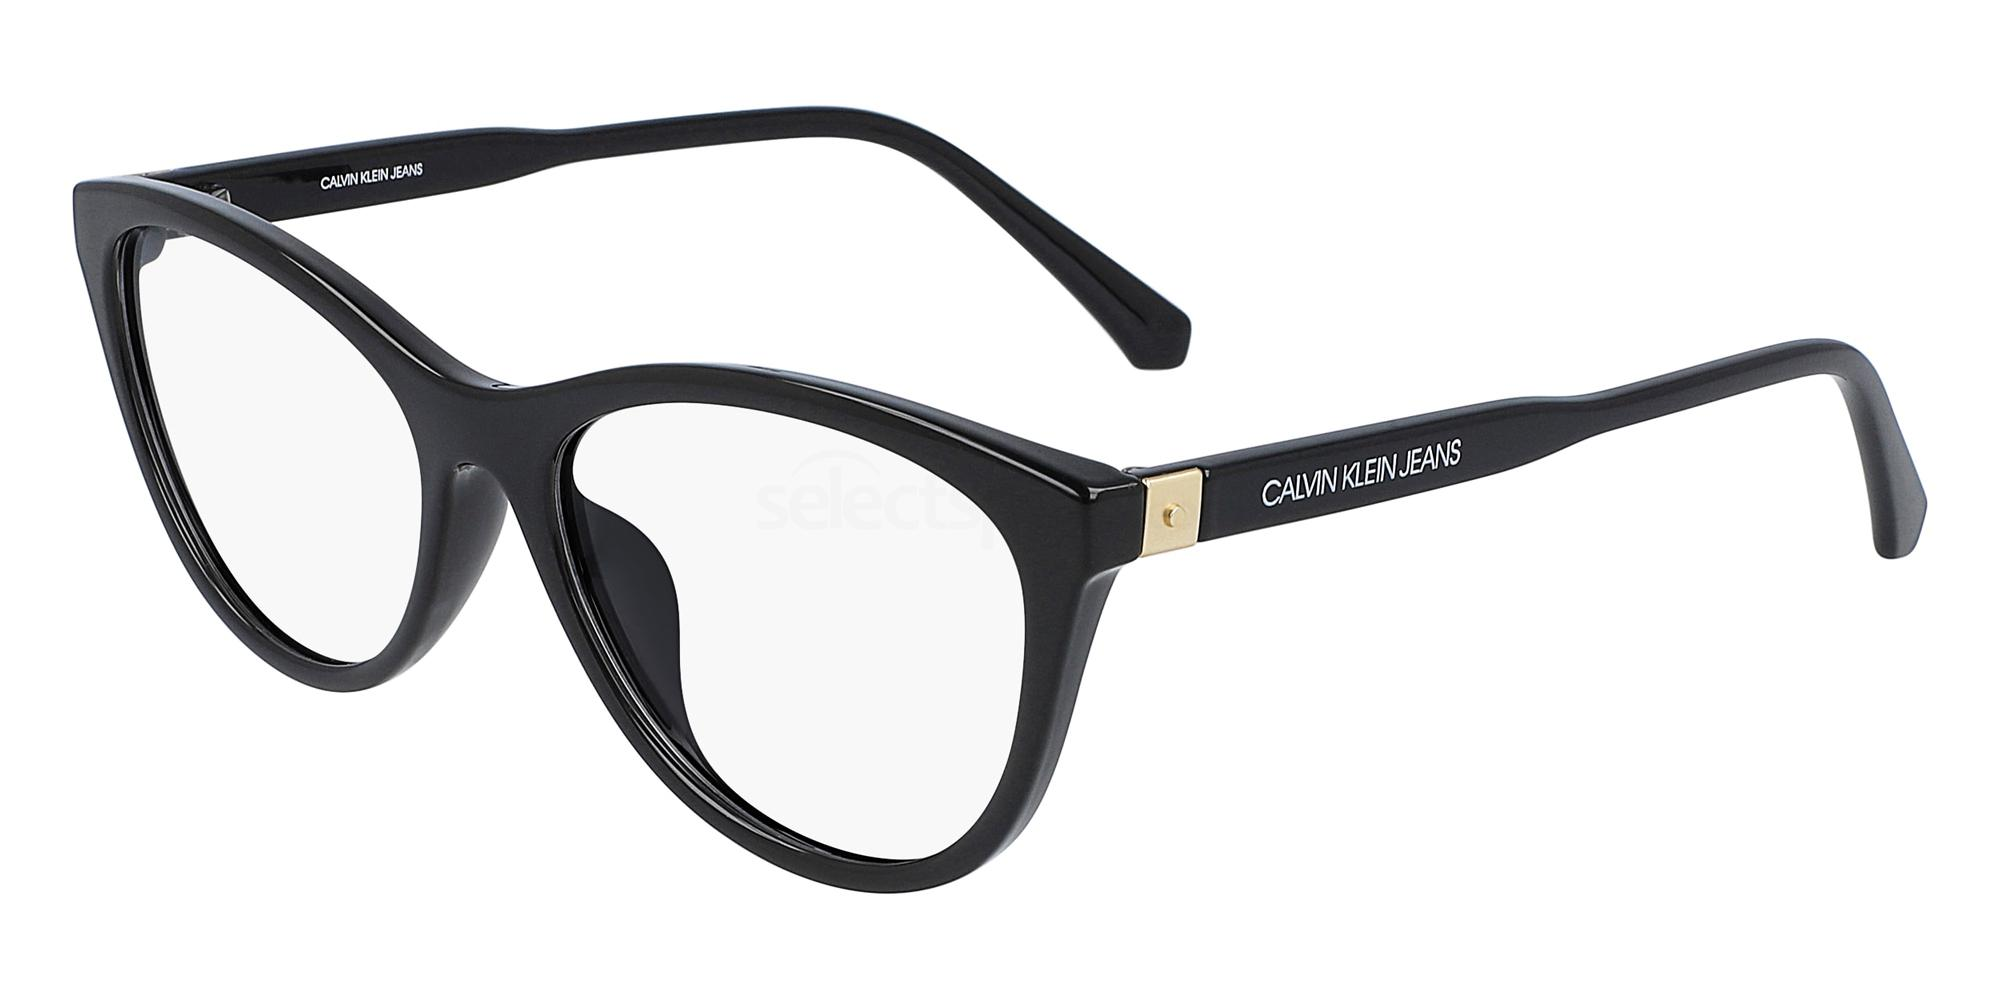 001 CKJ20510 Glasses, Calvin Klein Jeans